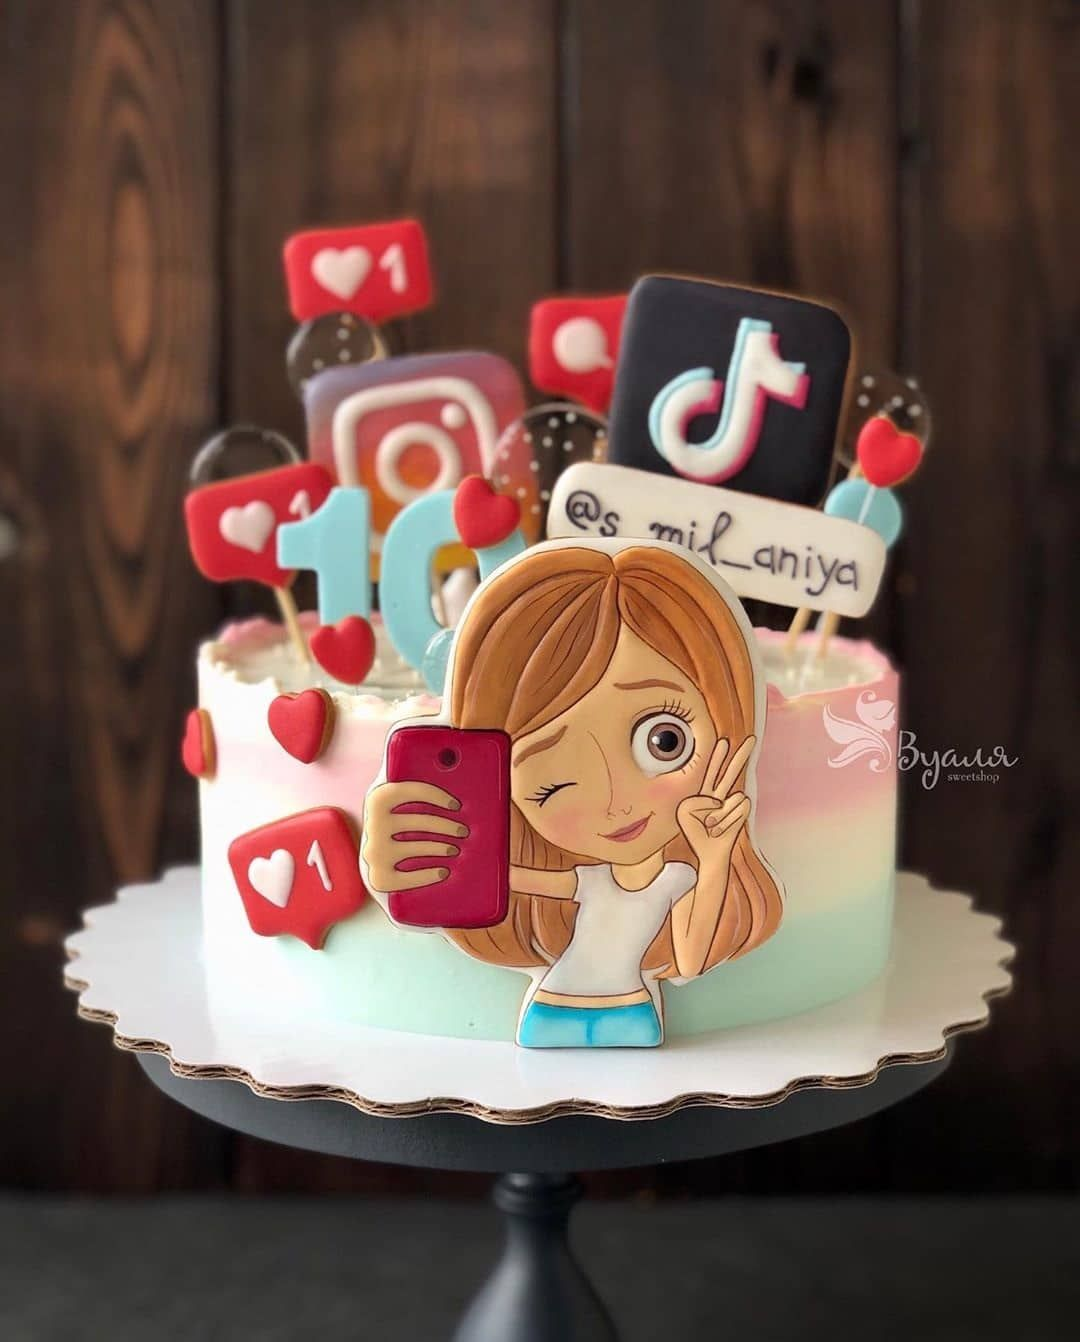 13 Cute Tik Tok Cake Ideas Some Are Absolutely Beautiful 14th Birthday Cakes Funny Birthday Cakes Unique Birthday Cakes